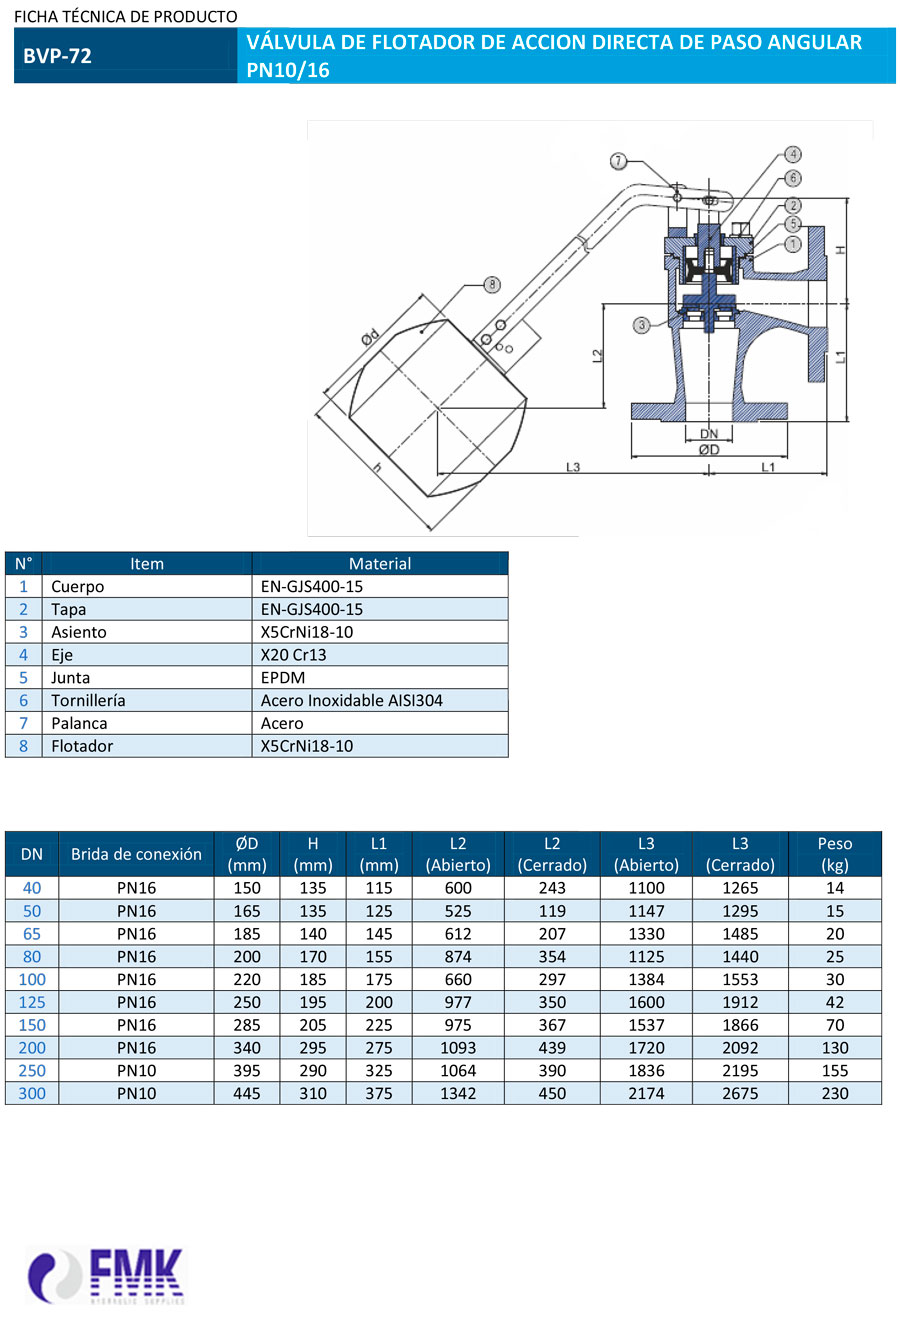 fmk-hydraulic-valvula-flotador-automatica-angular-bvp-72A-ficha-tecnica-2